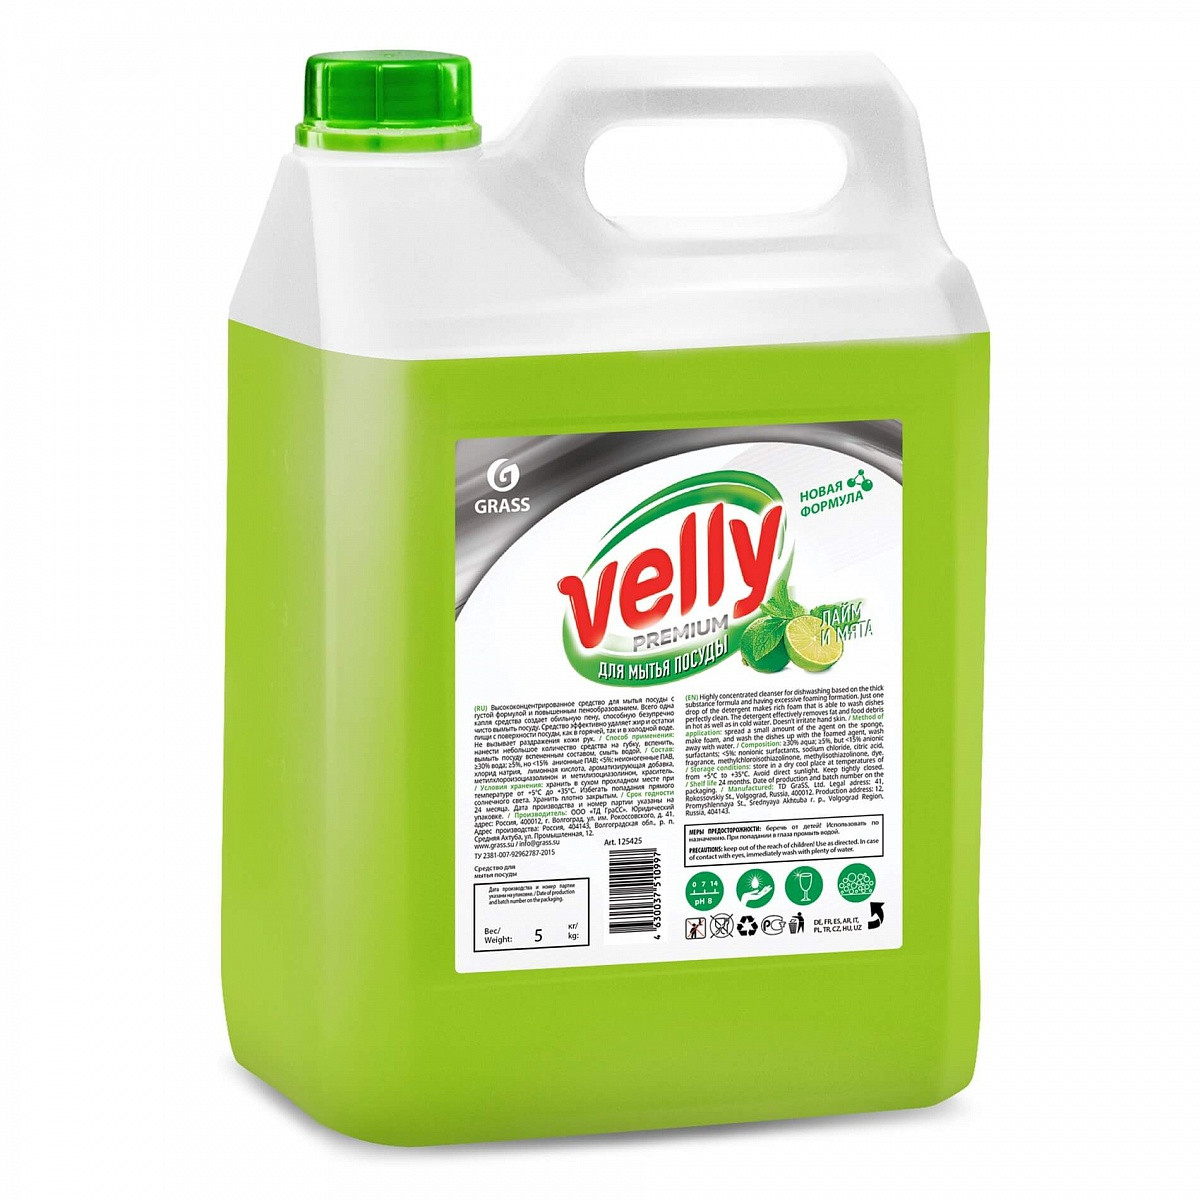 Средство для мытья посуды Velly Premium лайм и мята